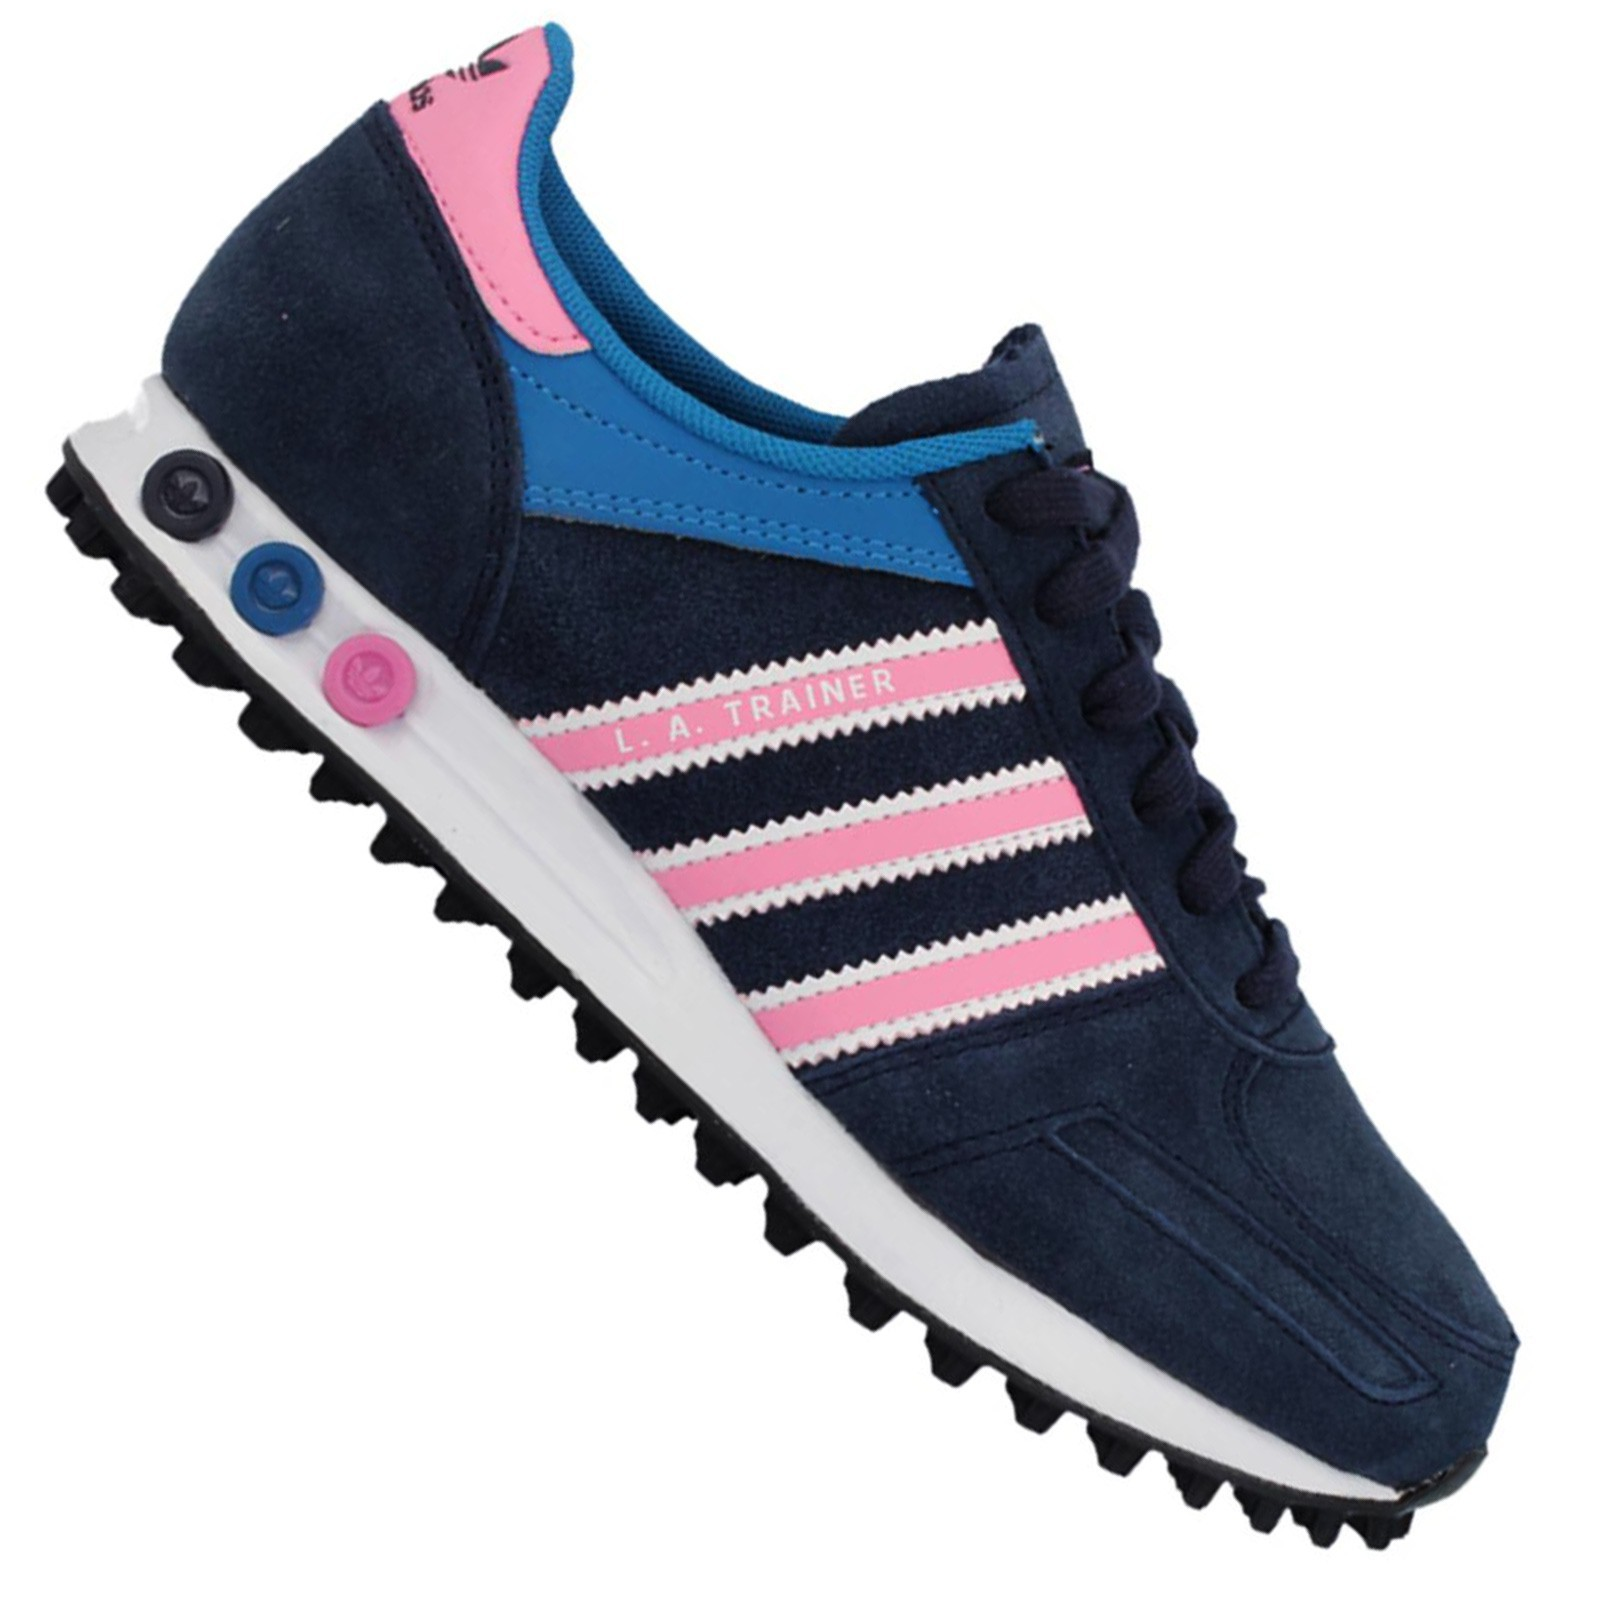 adidas originals la trainer ladies sneaker shoes gazelle. Black Bedroom Furniture Sets. Home Design Ideas